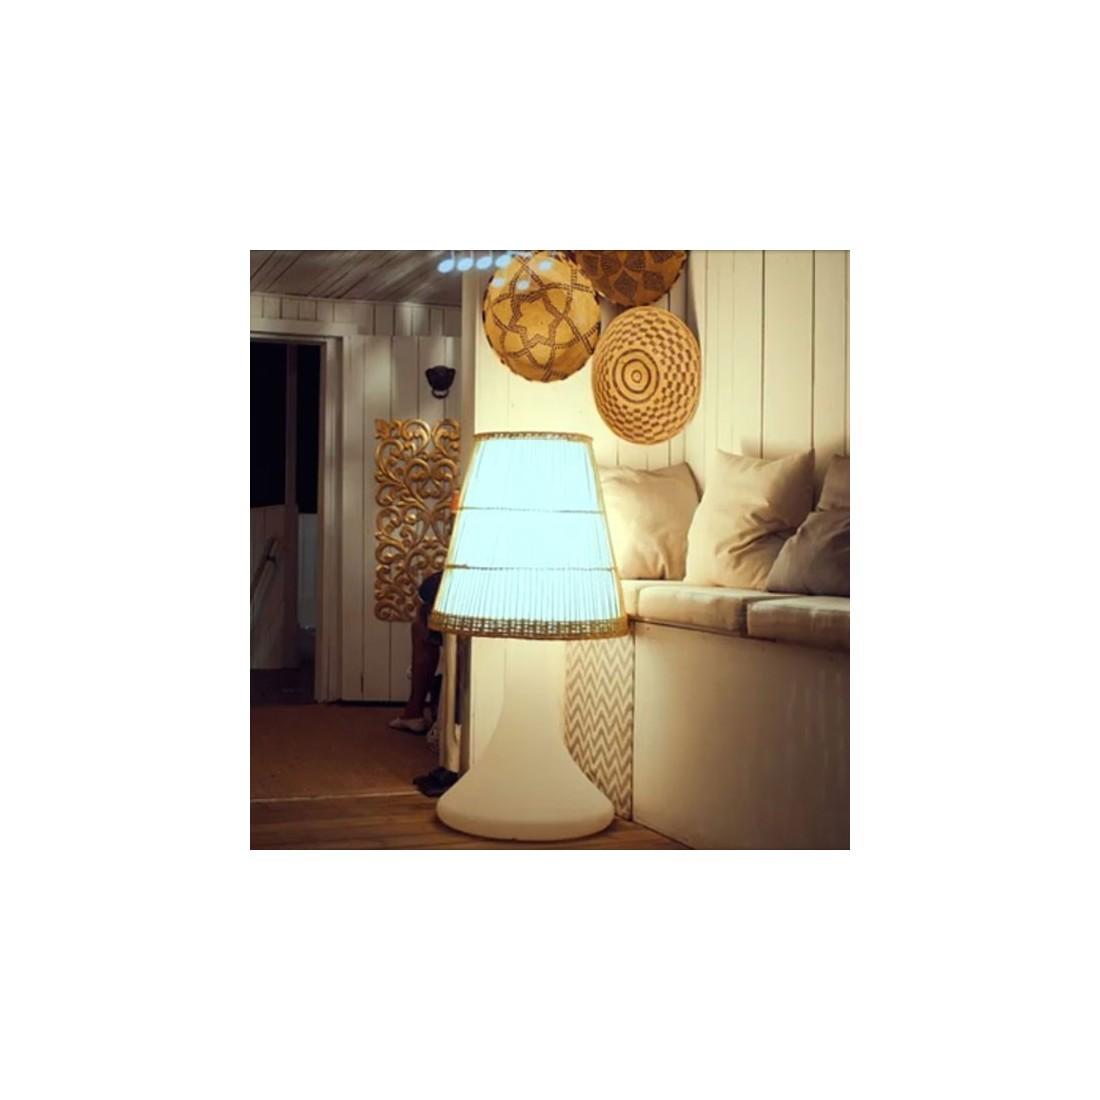 lampe sans fil avec enceinte bluetooth handy large. Black Bedroom Furniture Sets. Home Design Ideas